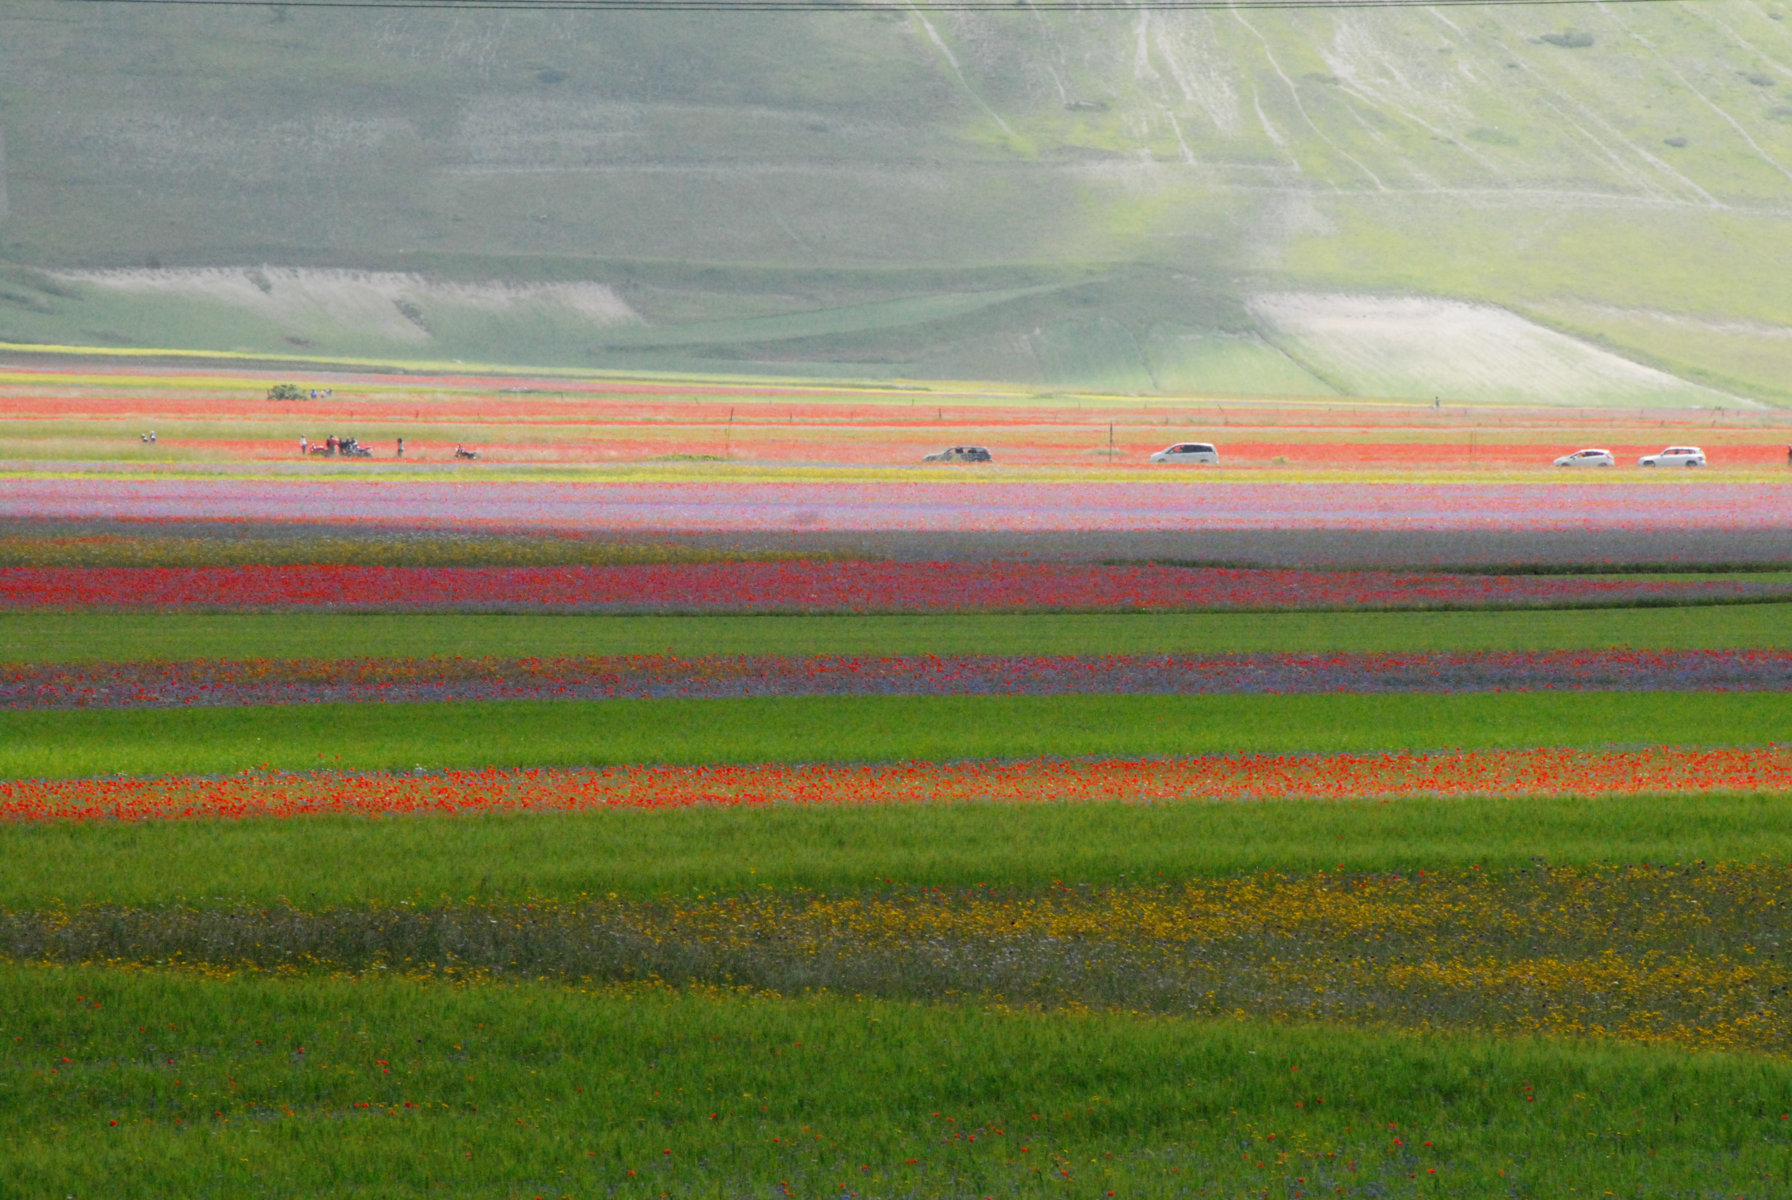 2014-la-fiorita-1a-439-fileminimizer